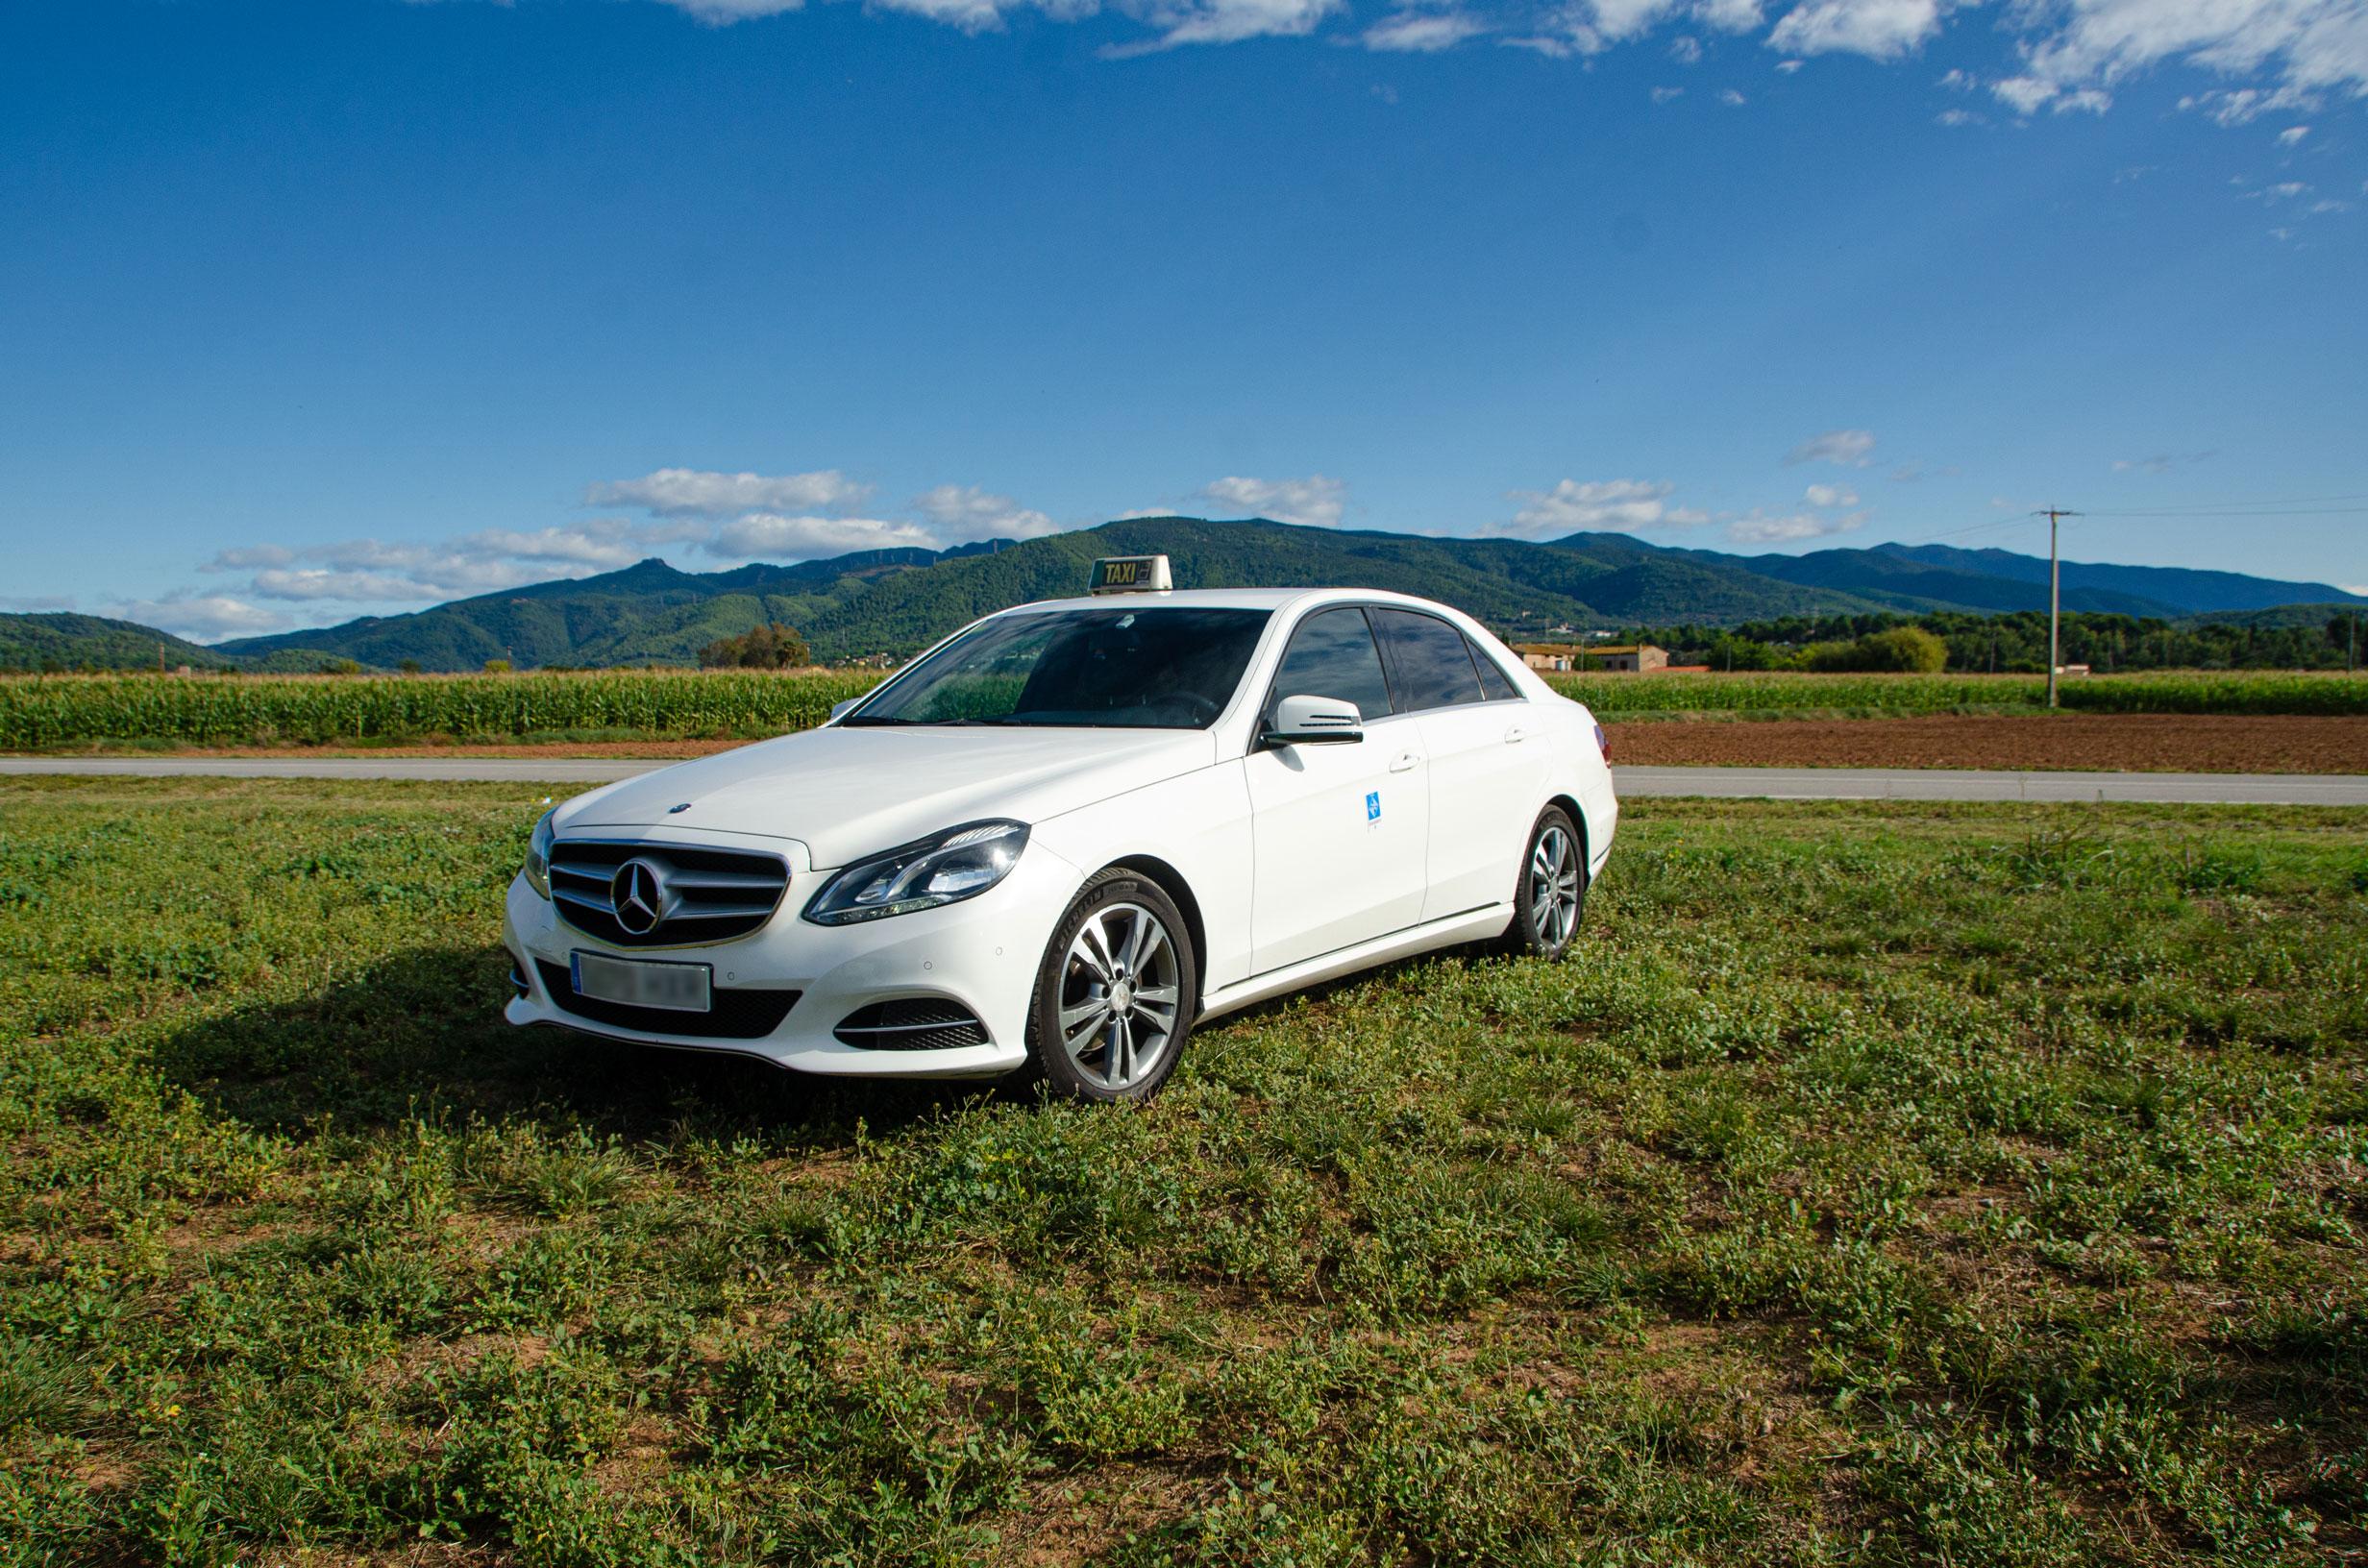 Mercedes Berlina - Ràdio Taxi Granollers Vallès Oriental